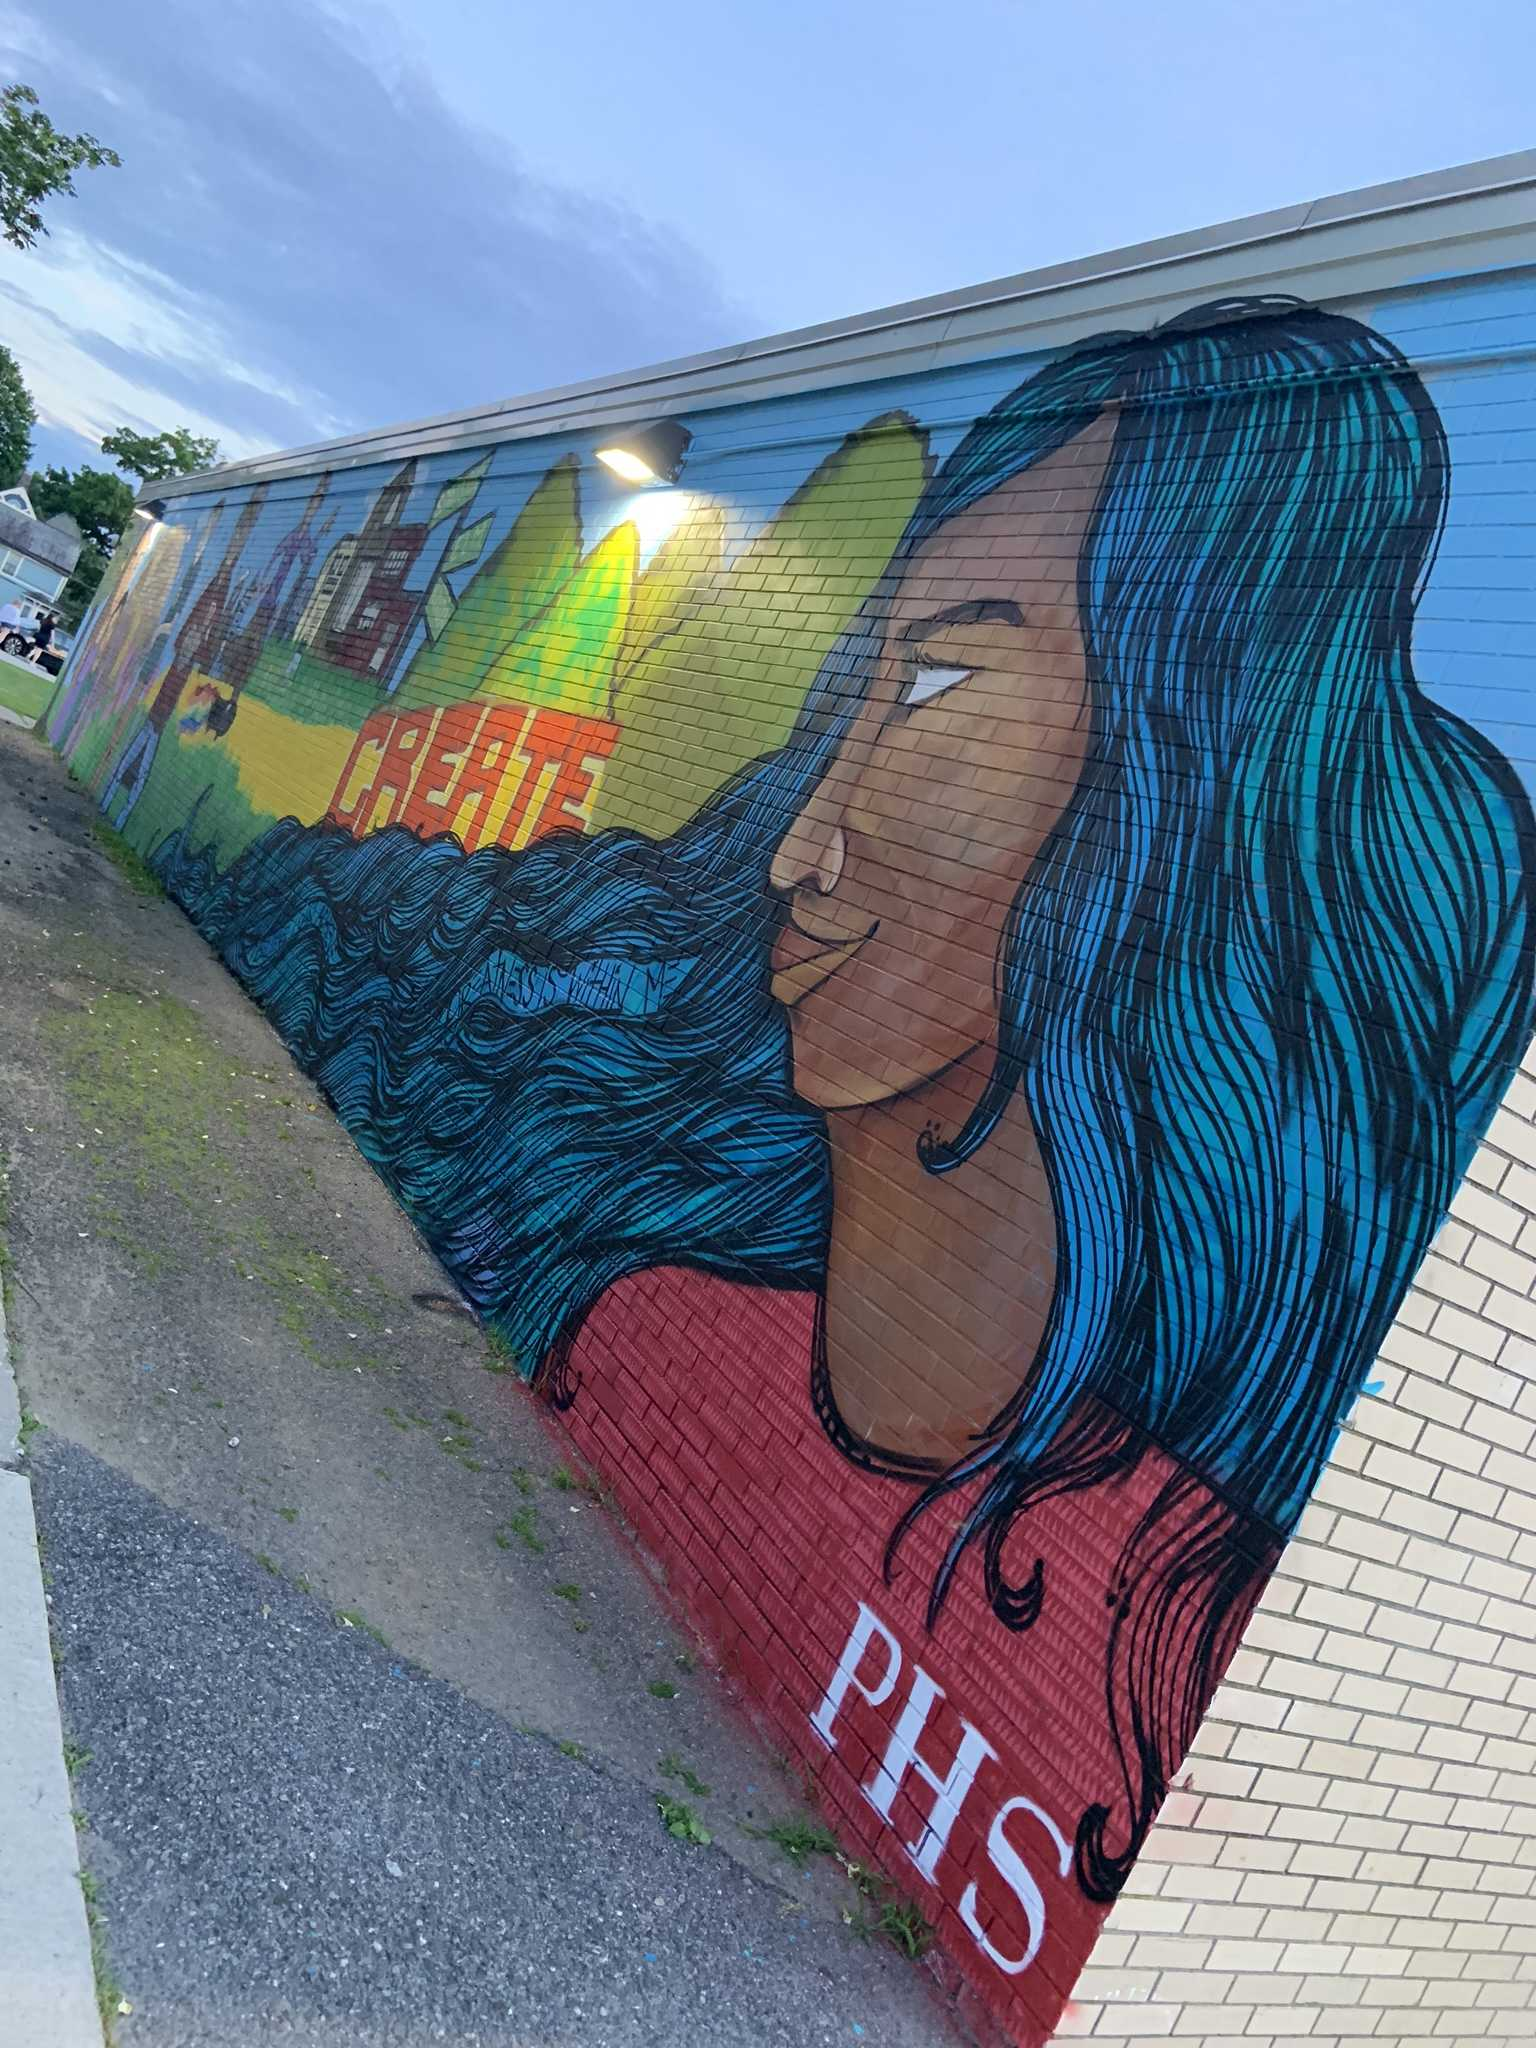 Mural - far right